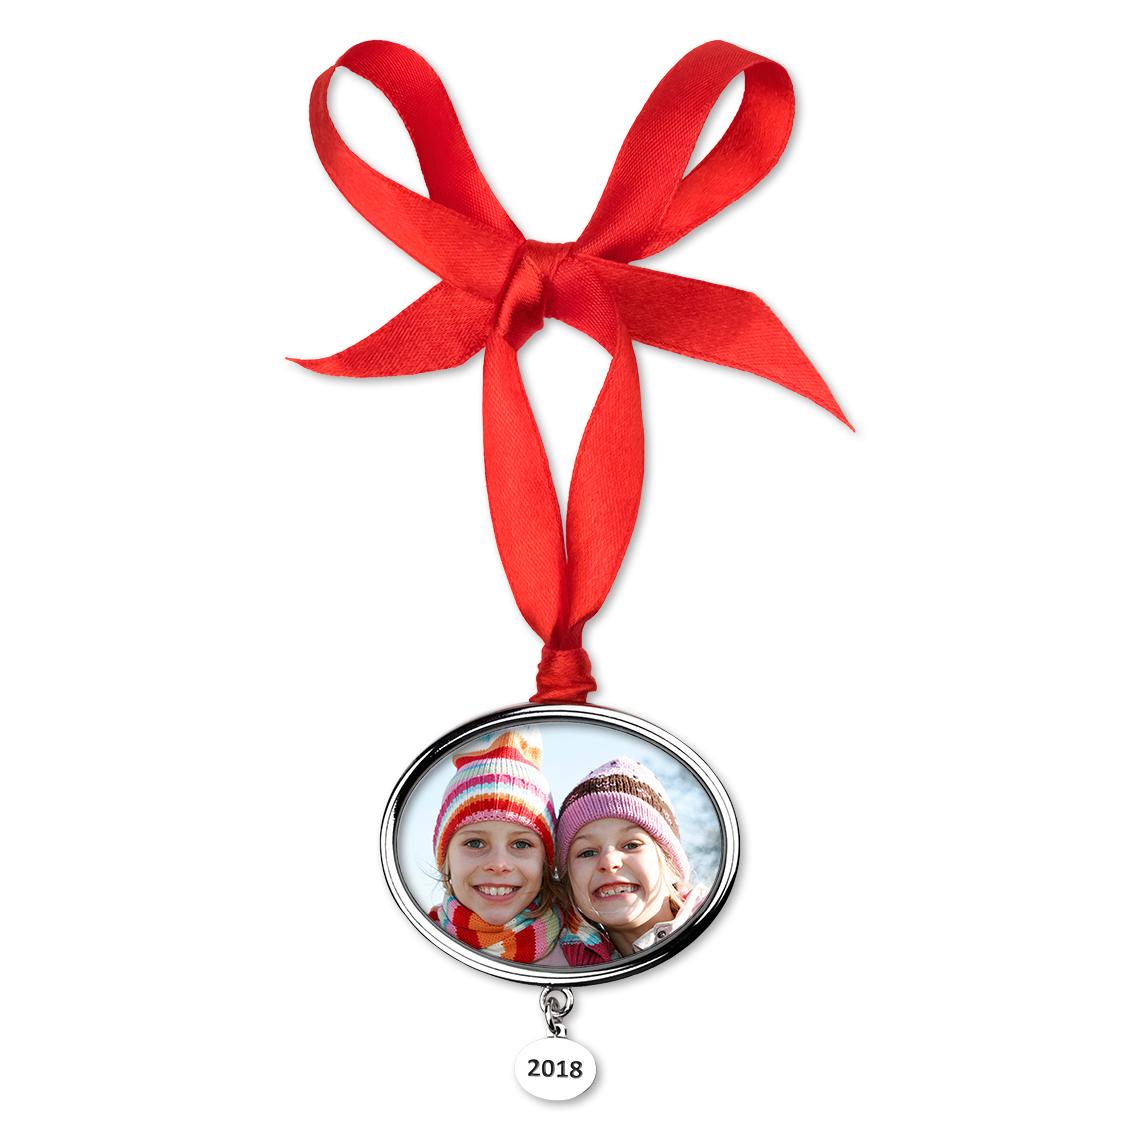 Icon Year Charm Ornament